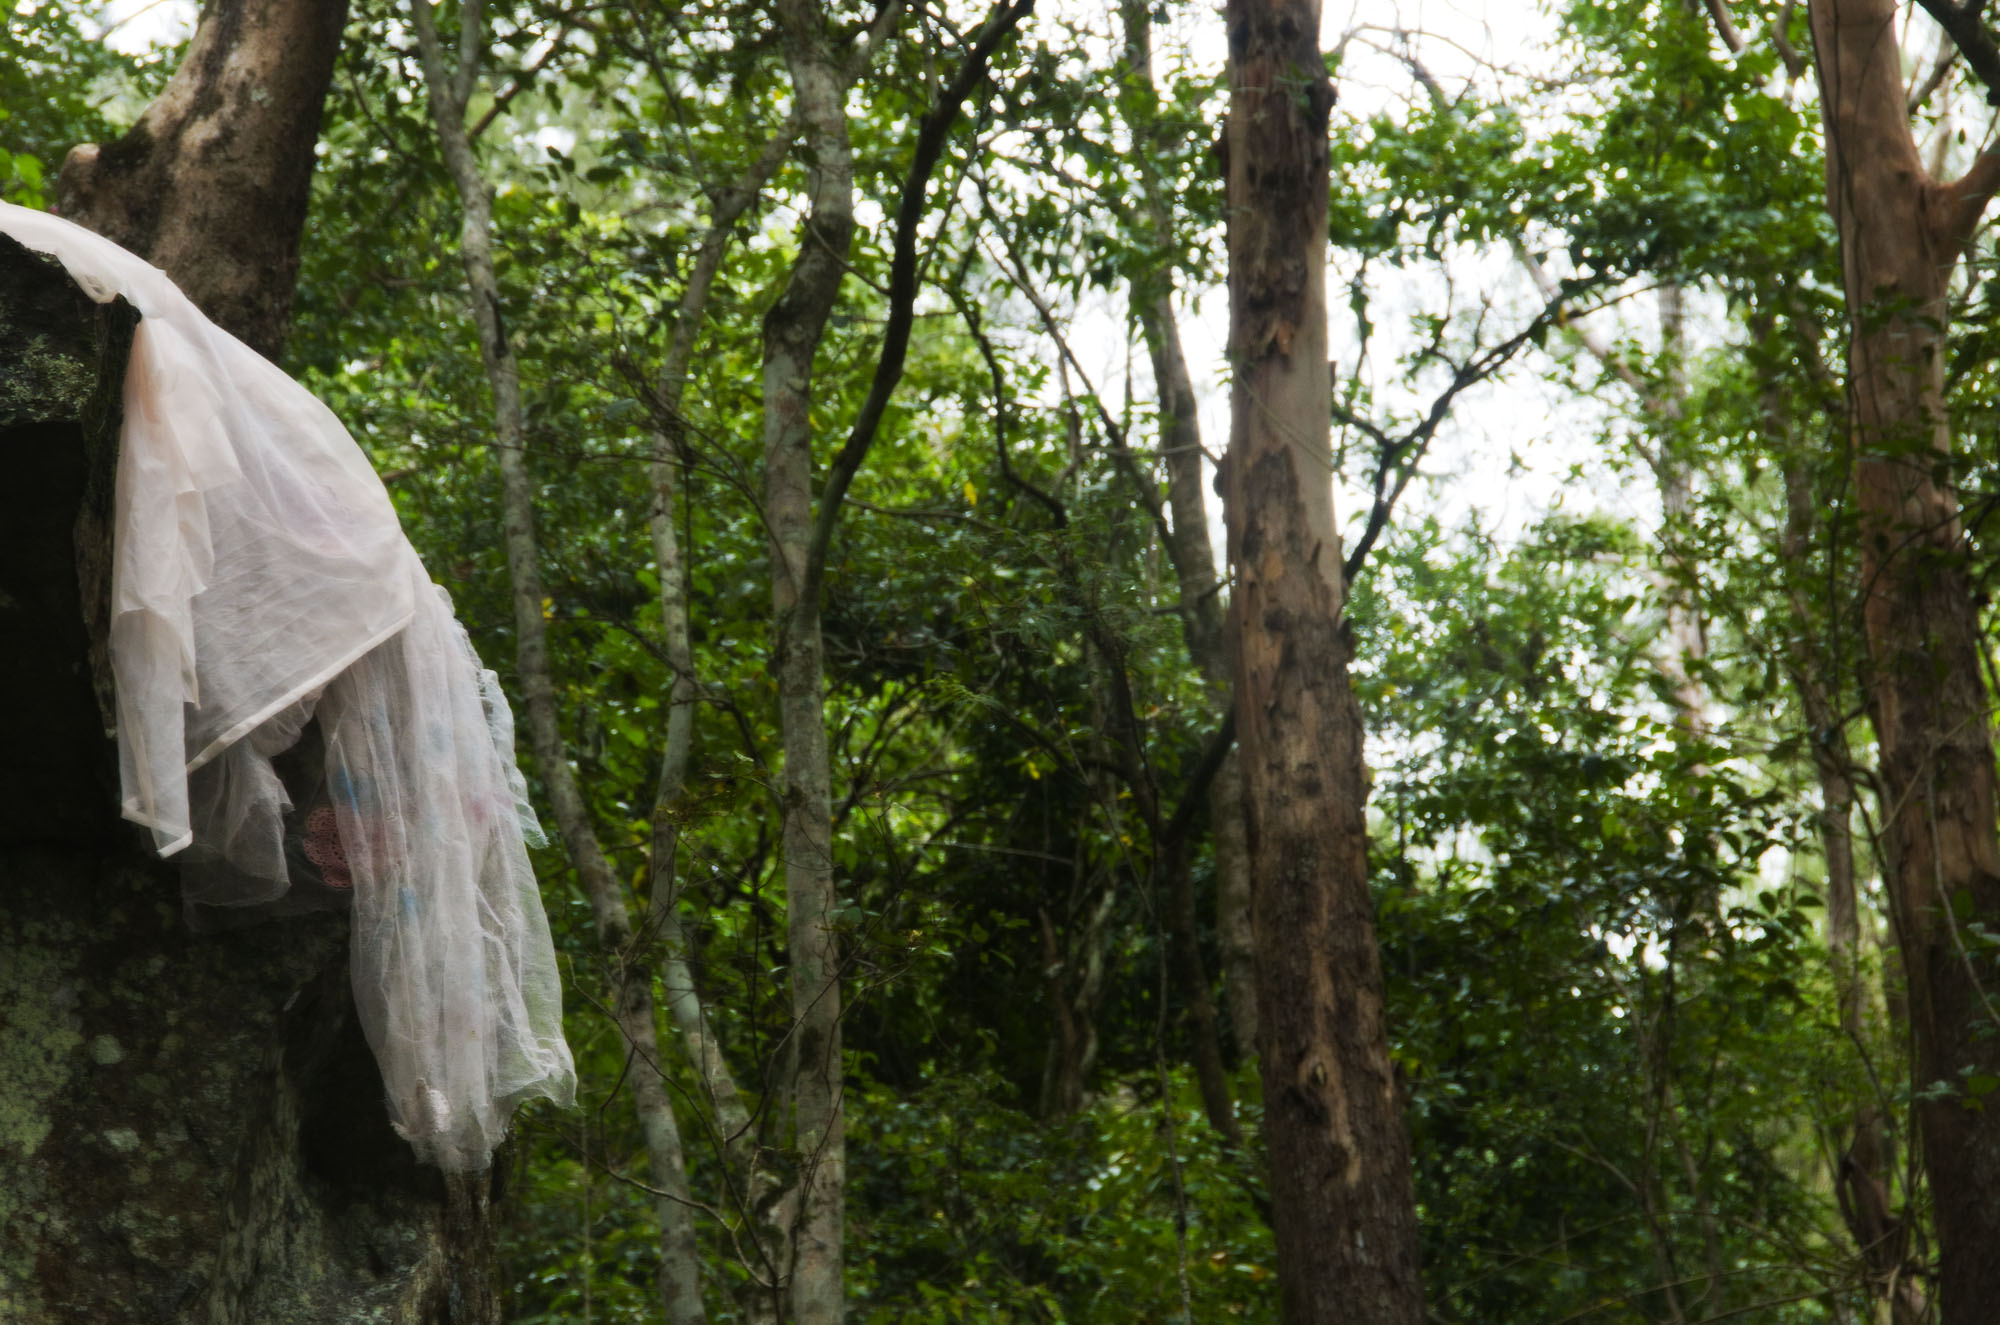 boho fashion in rainforest